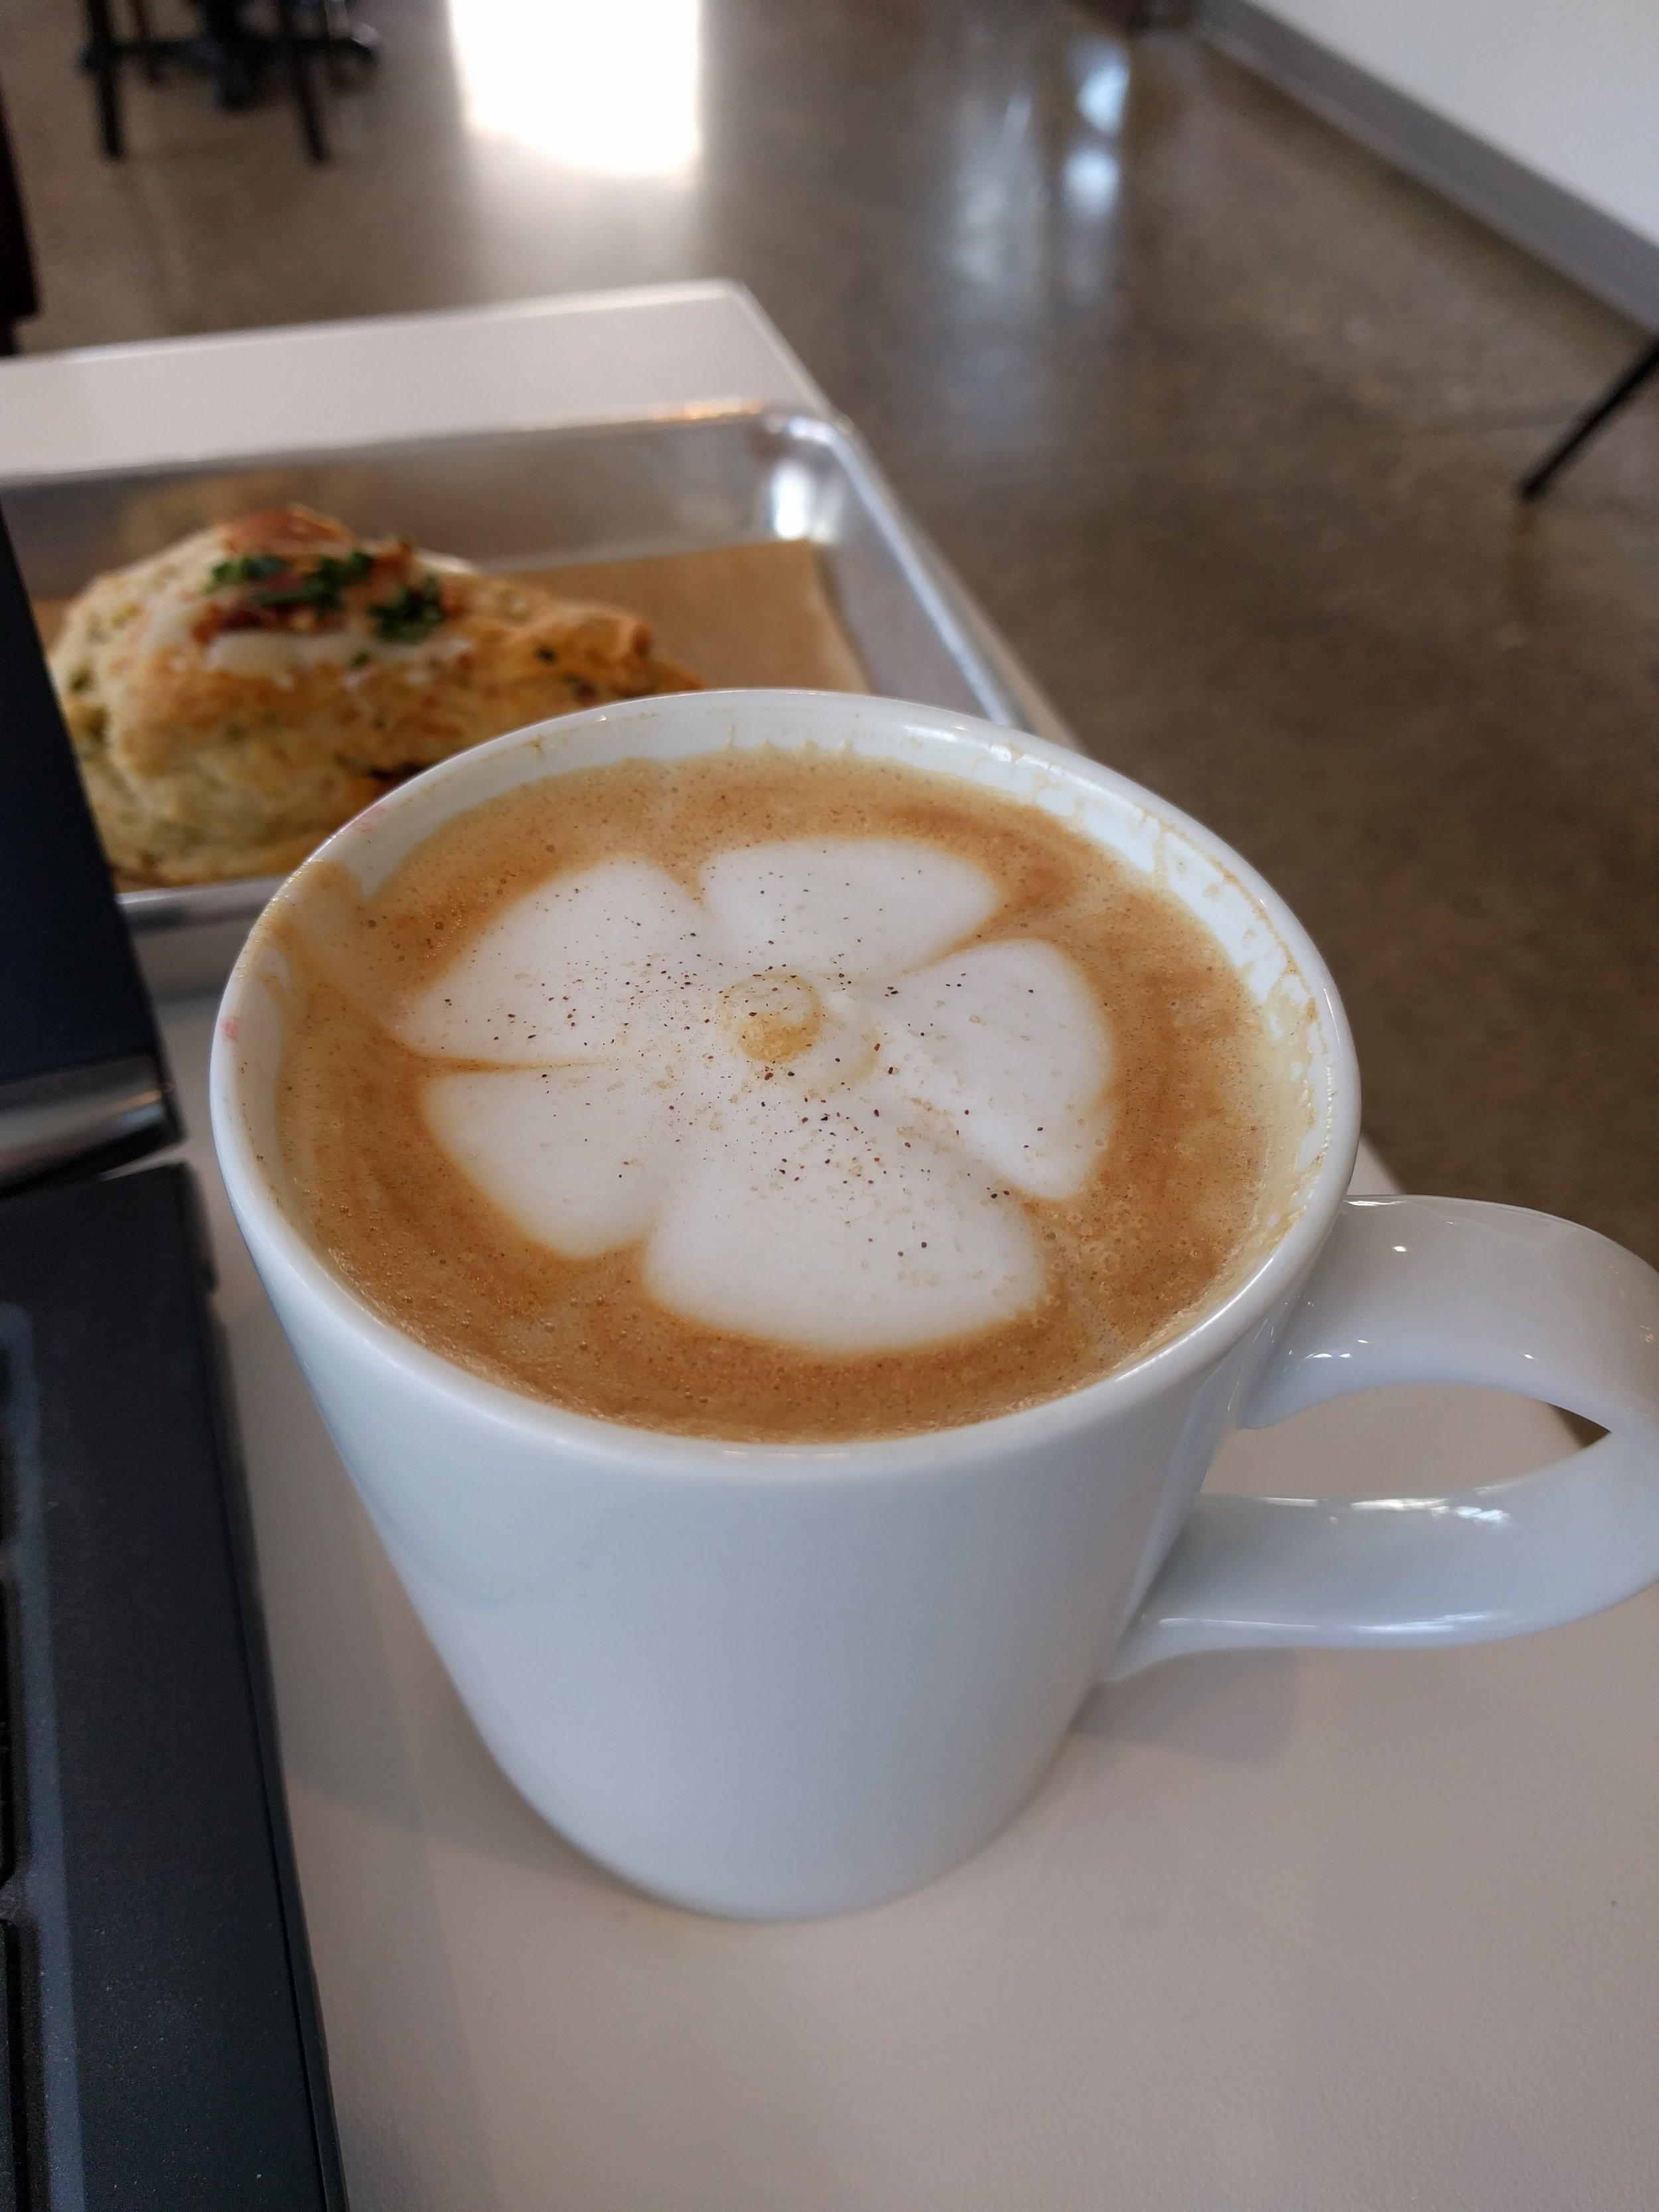 Miel Latte (aka honey latte) from That Early Bird